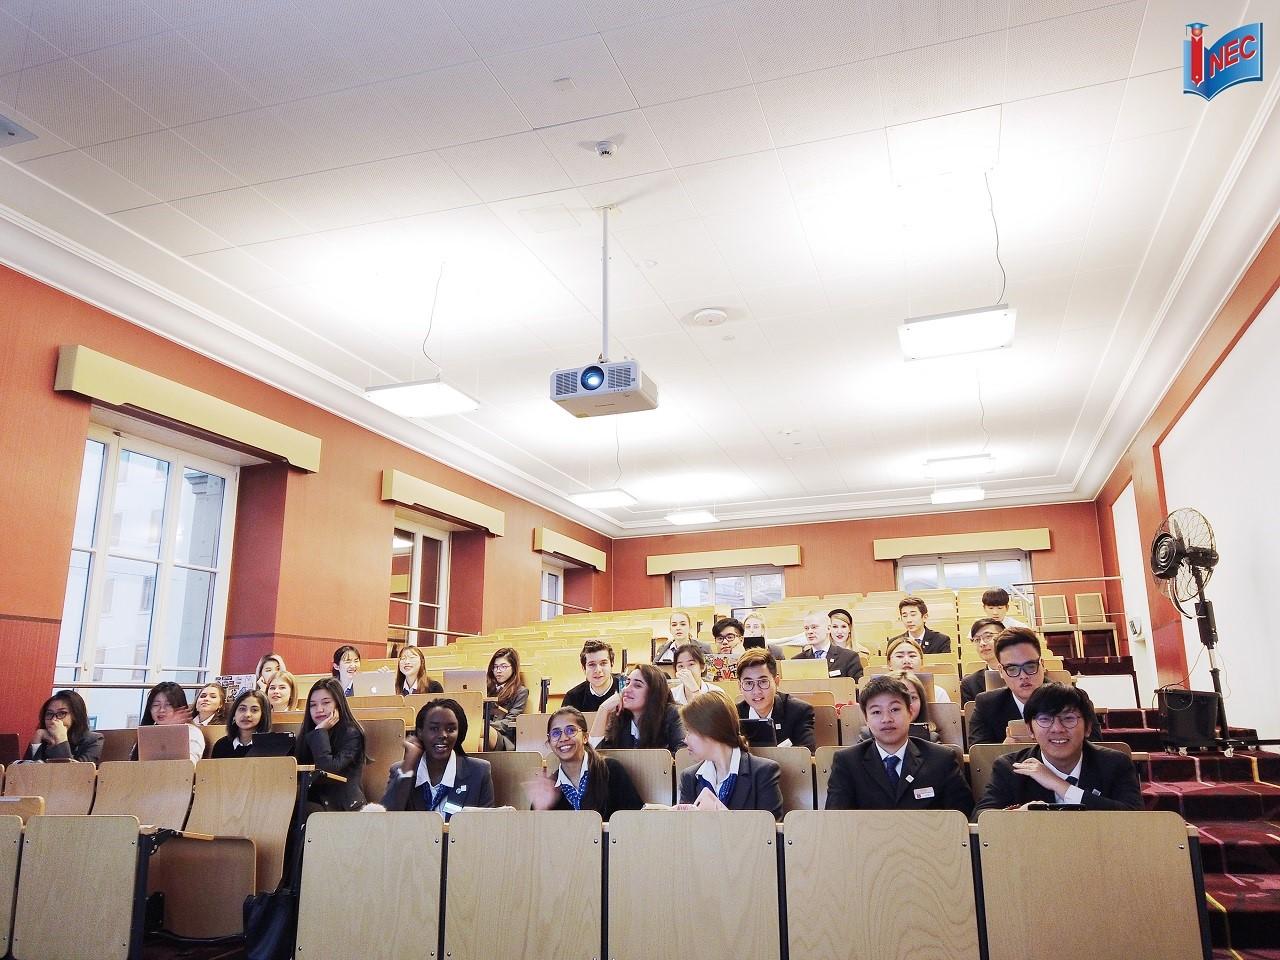 Một lớp học tại César Ritz Colleges Luzern